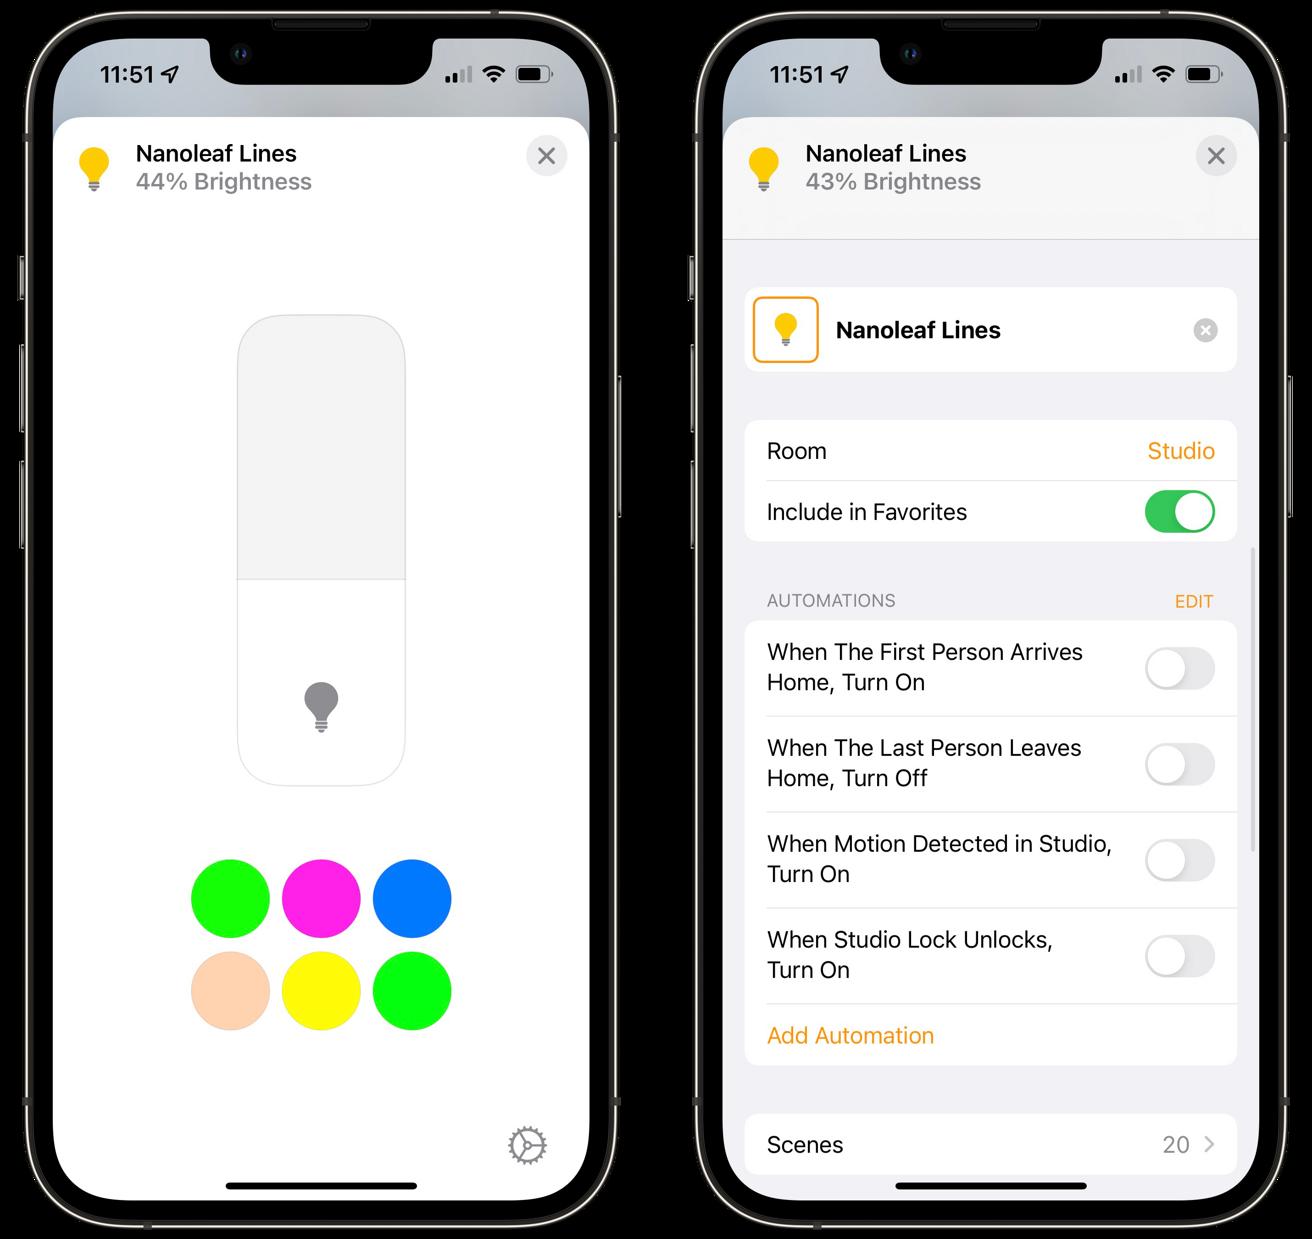 Nanoleaf Lines in the Home app